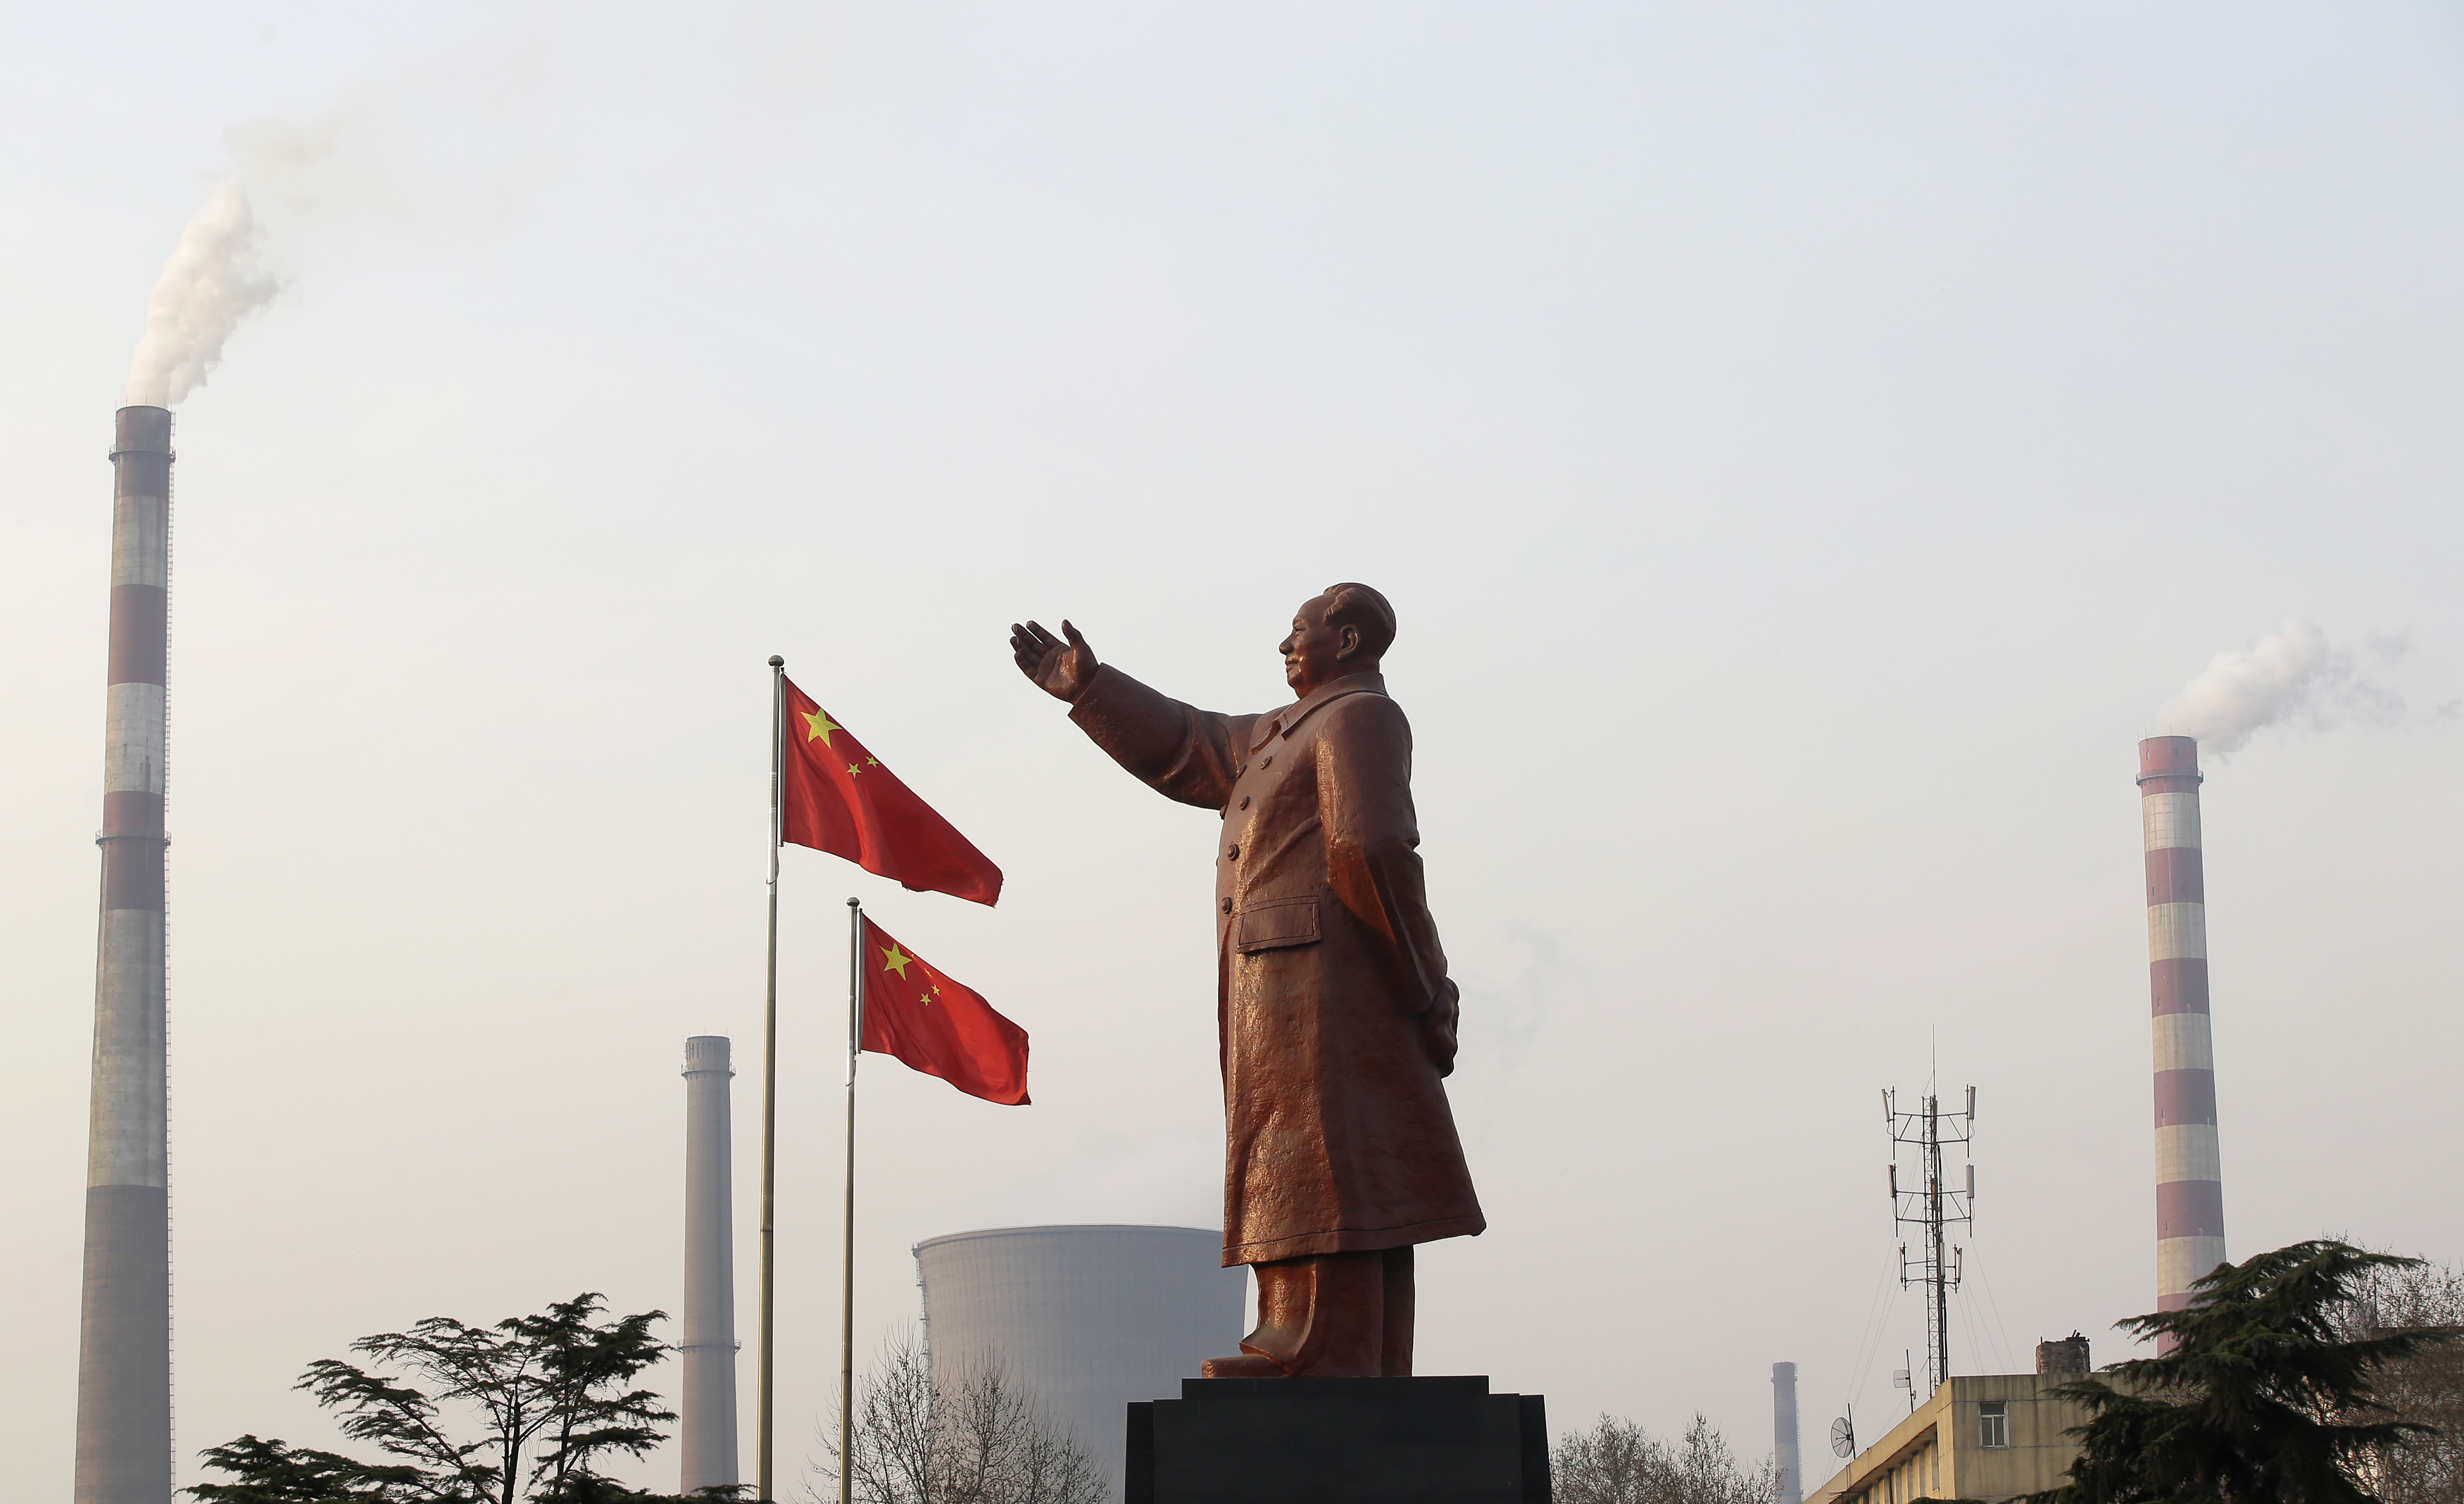 zedong_mao_statue001